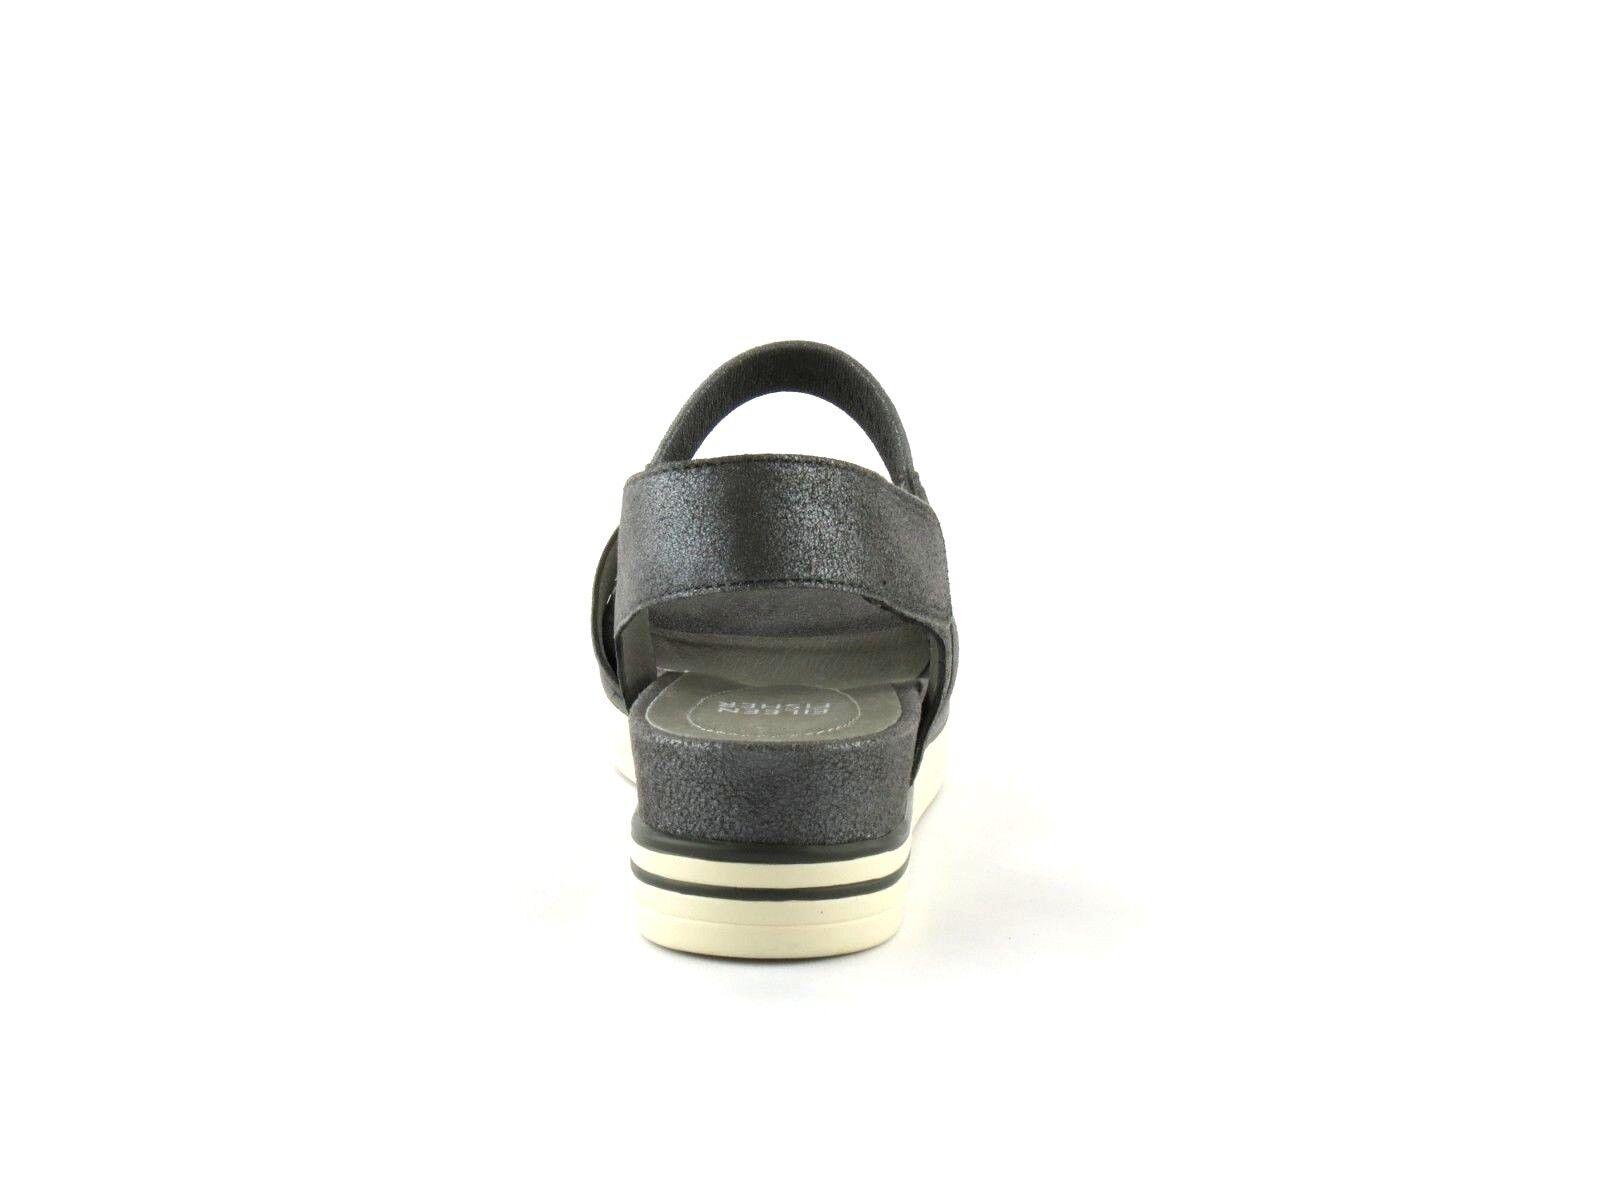 Eileen Fisher Somer argent métallisé en cuir cuir cuir et daim plateforme baskets Sandale 10 NEUF bb4ccc